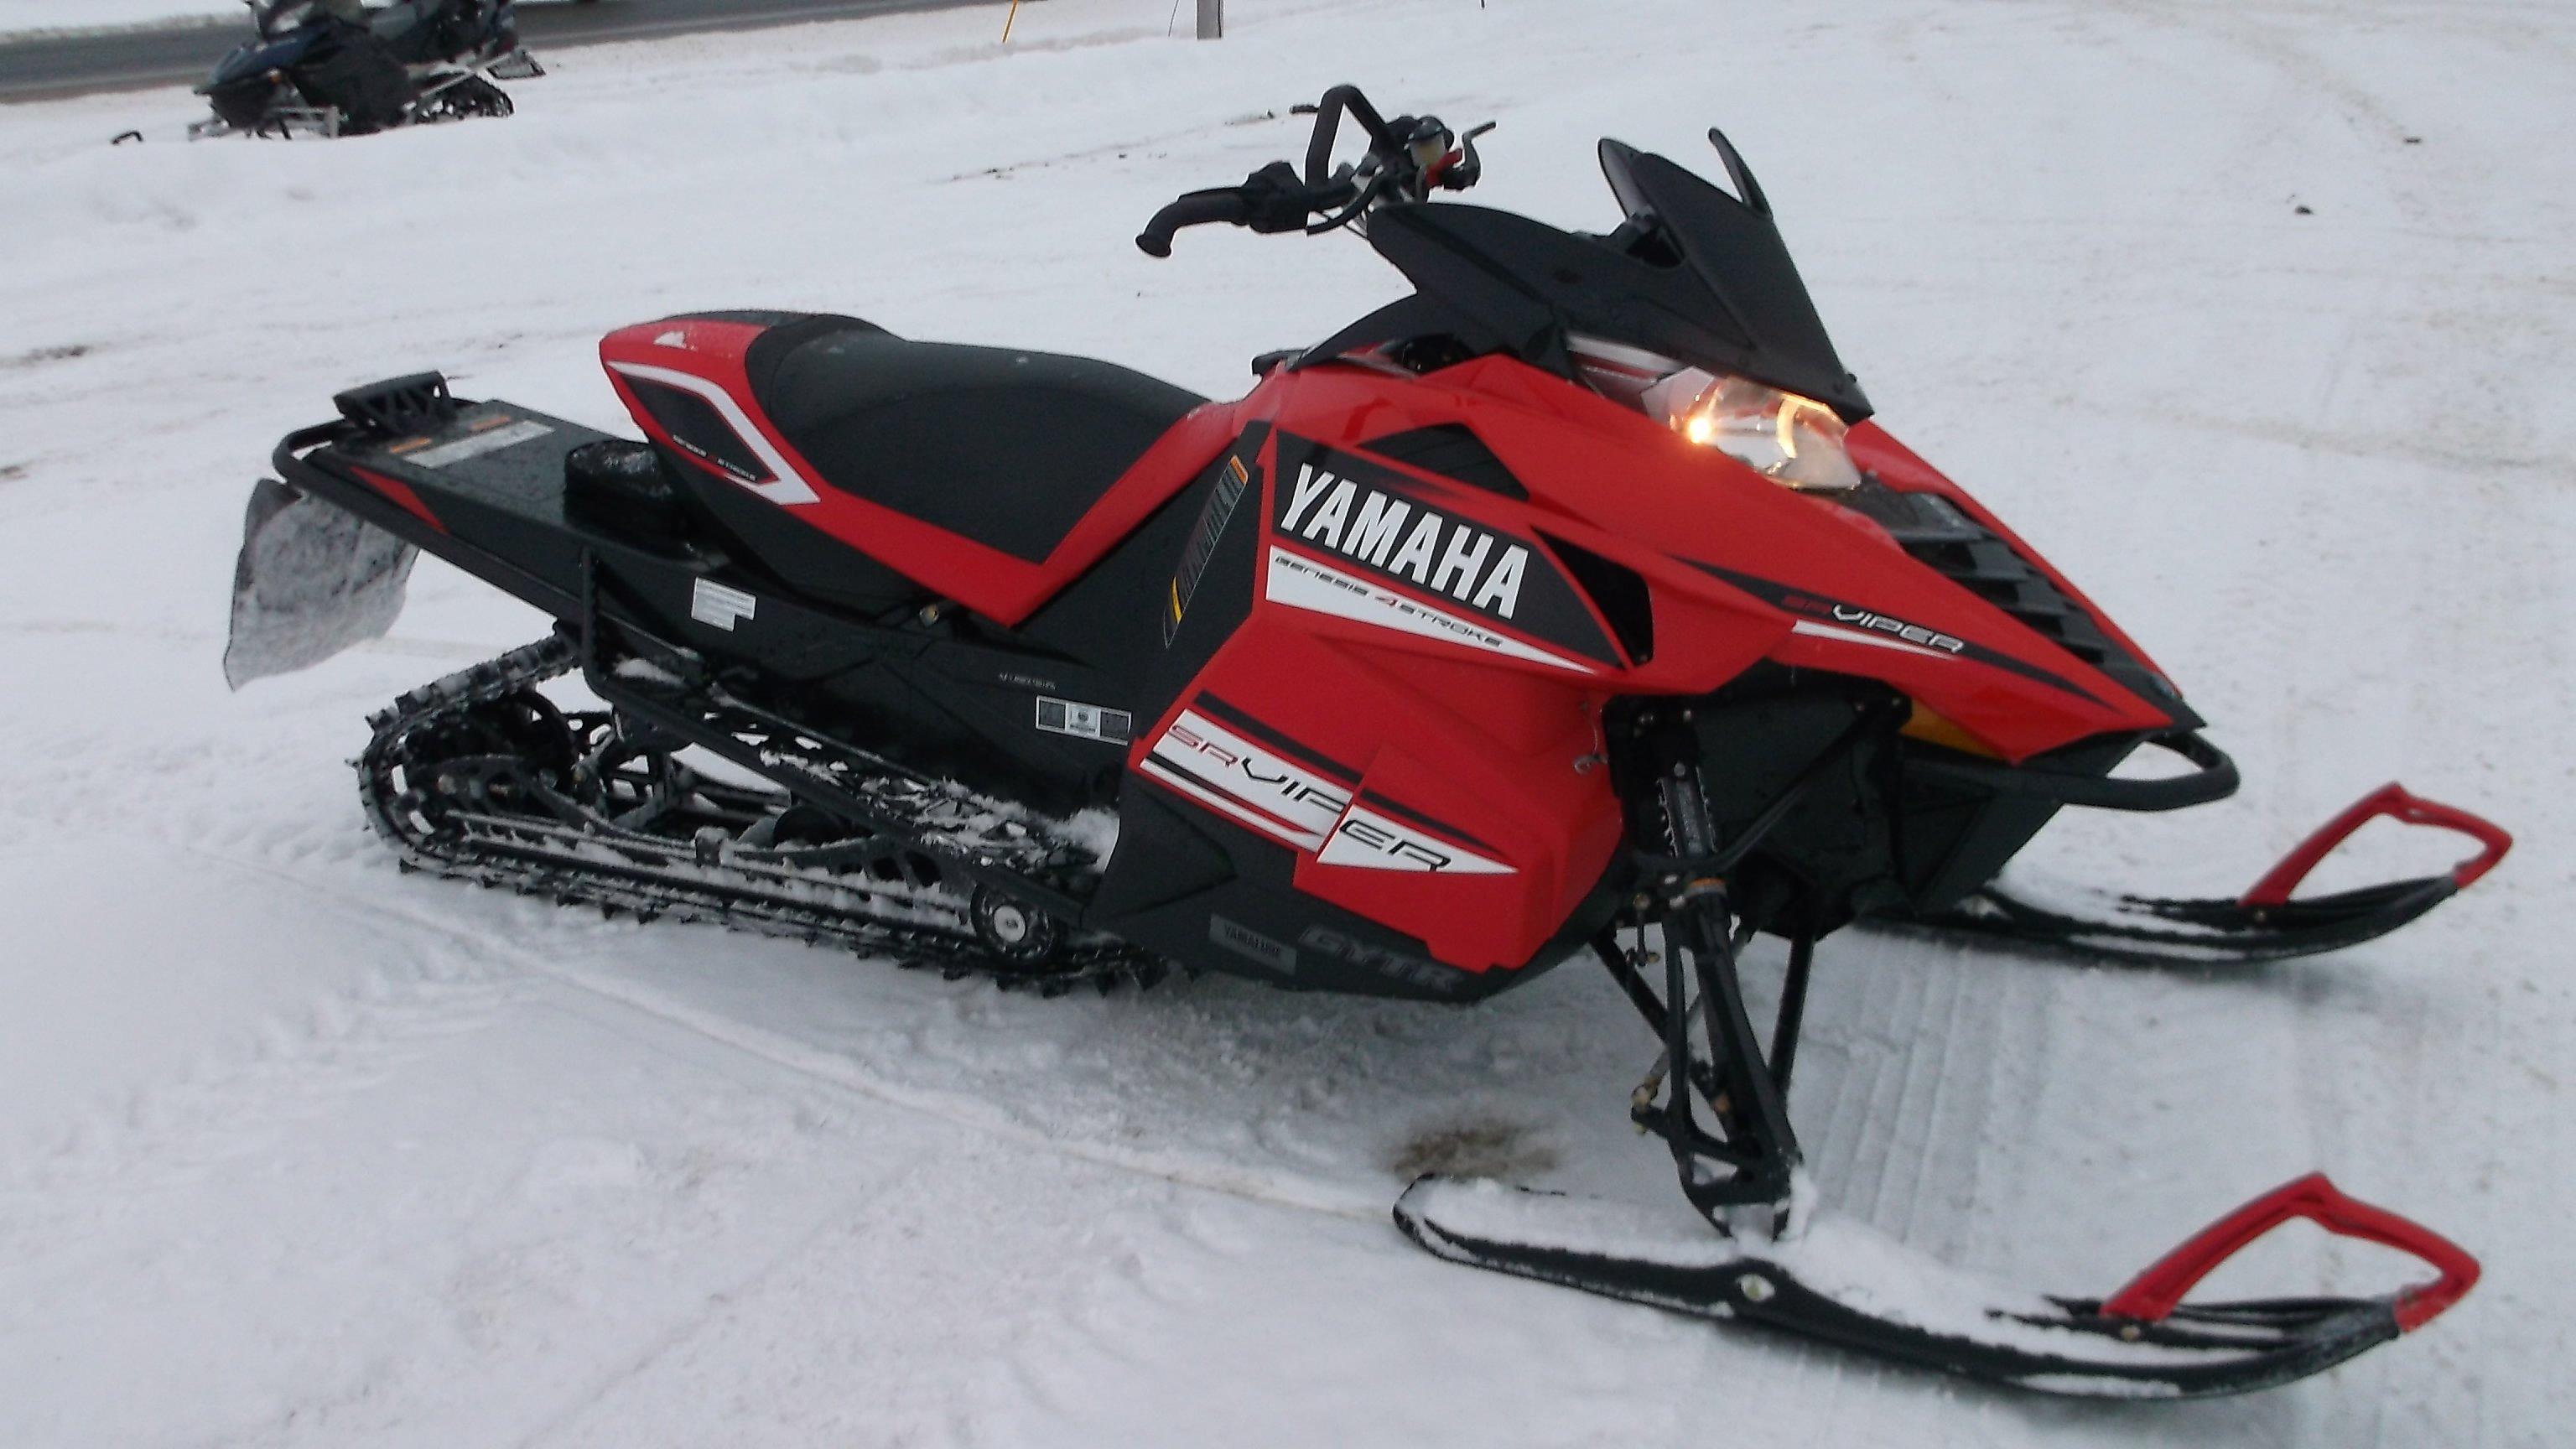 Yamaha Snowmobile Specs